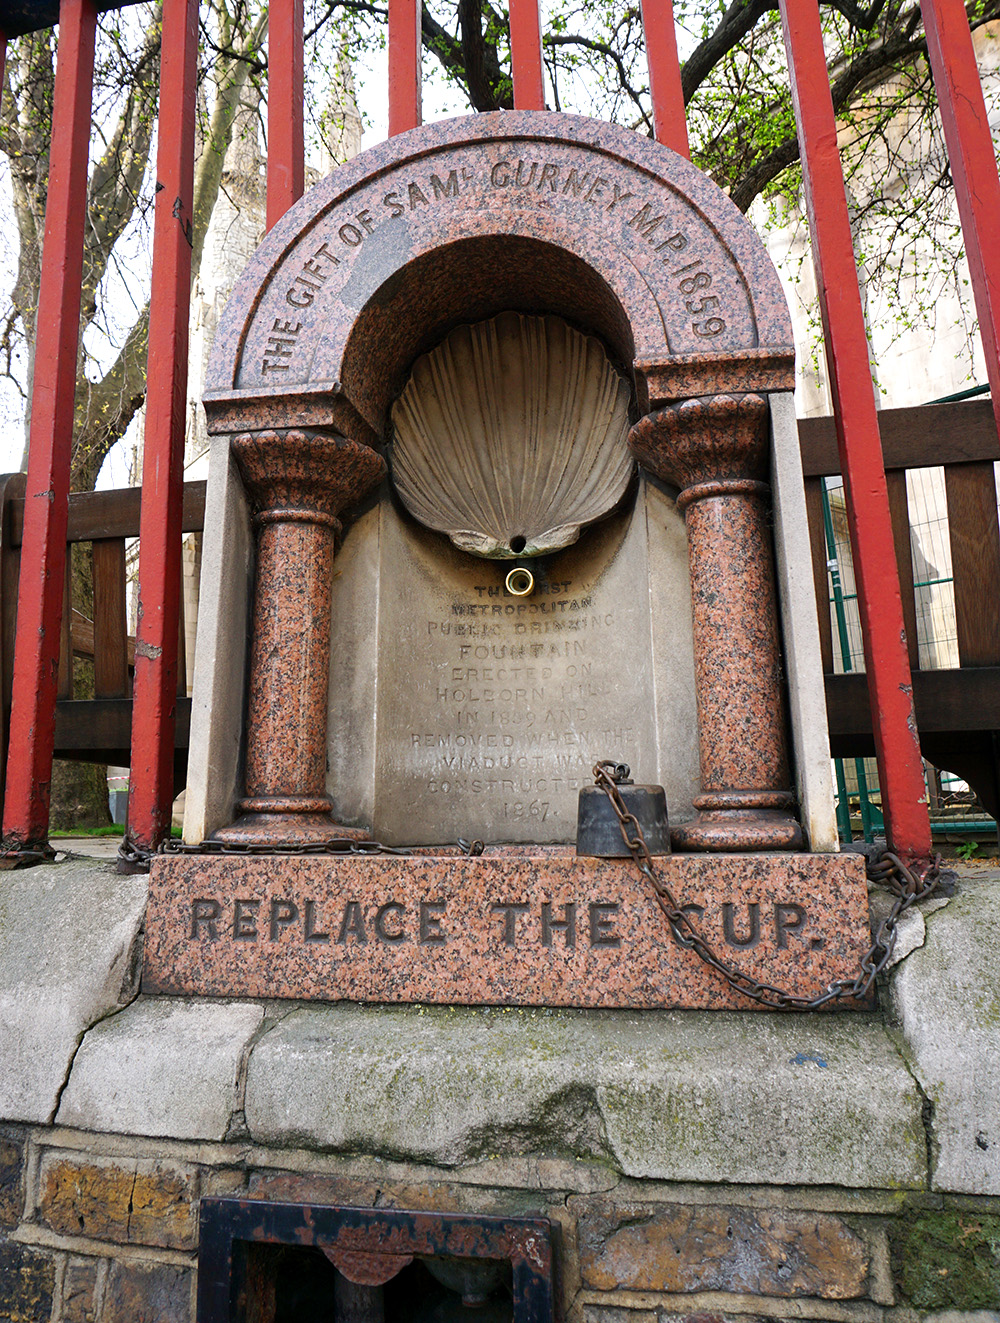 London's First Public Fountain